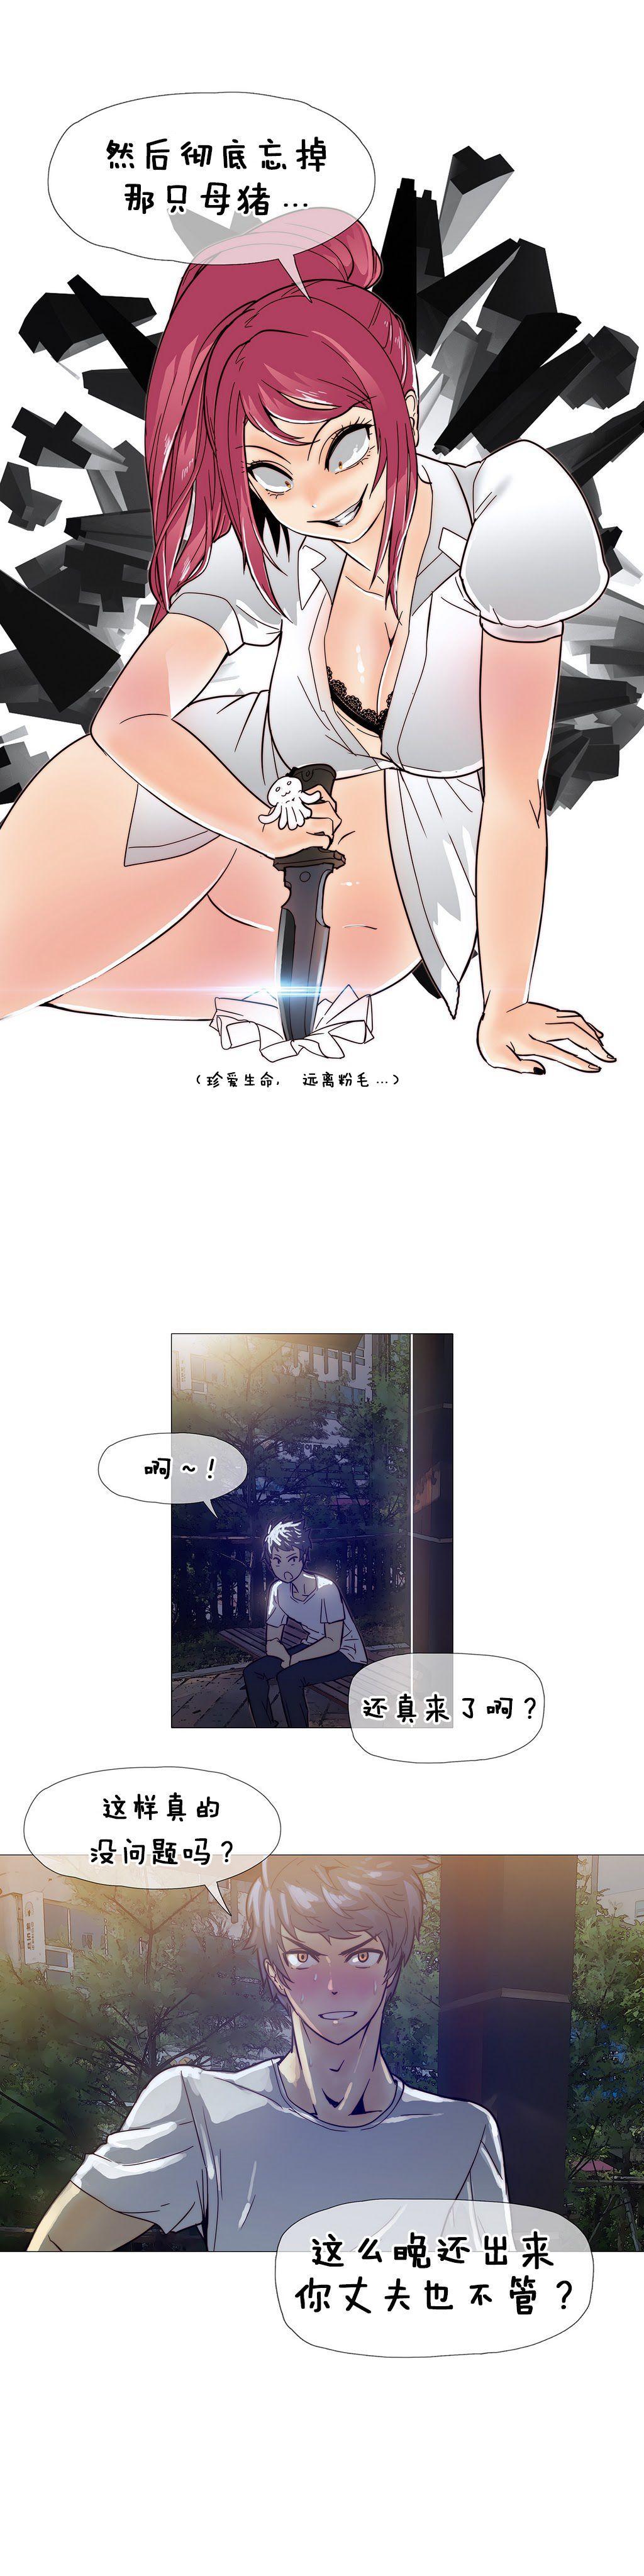 HouseHold Affairs 【卞赤鲤个人汉化】1~33话(持续更新中) 169